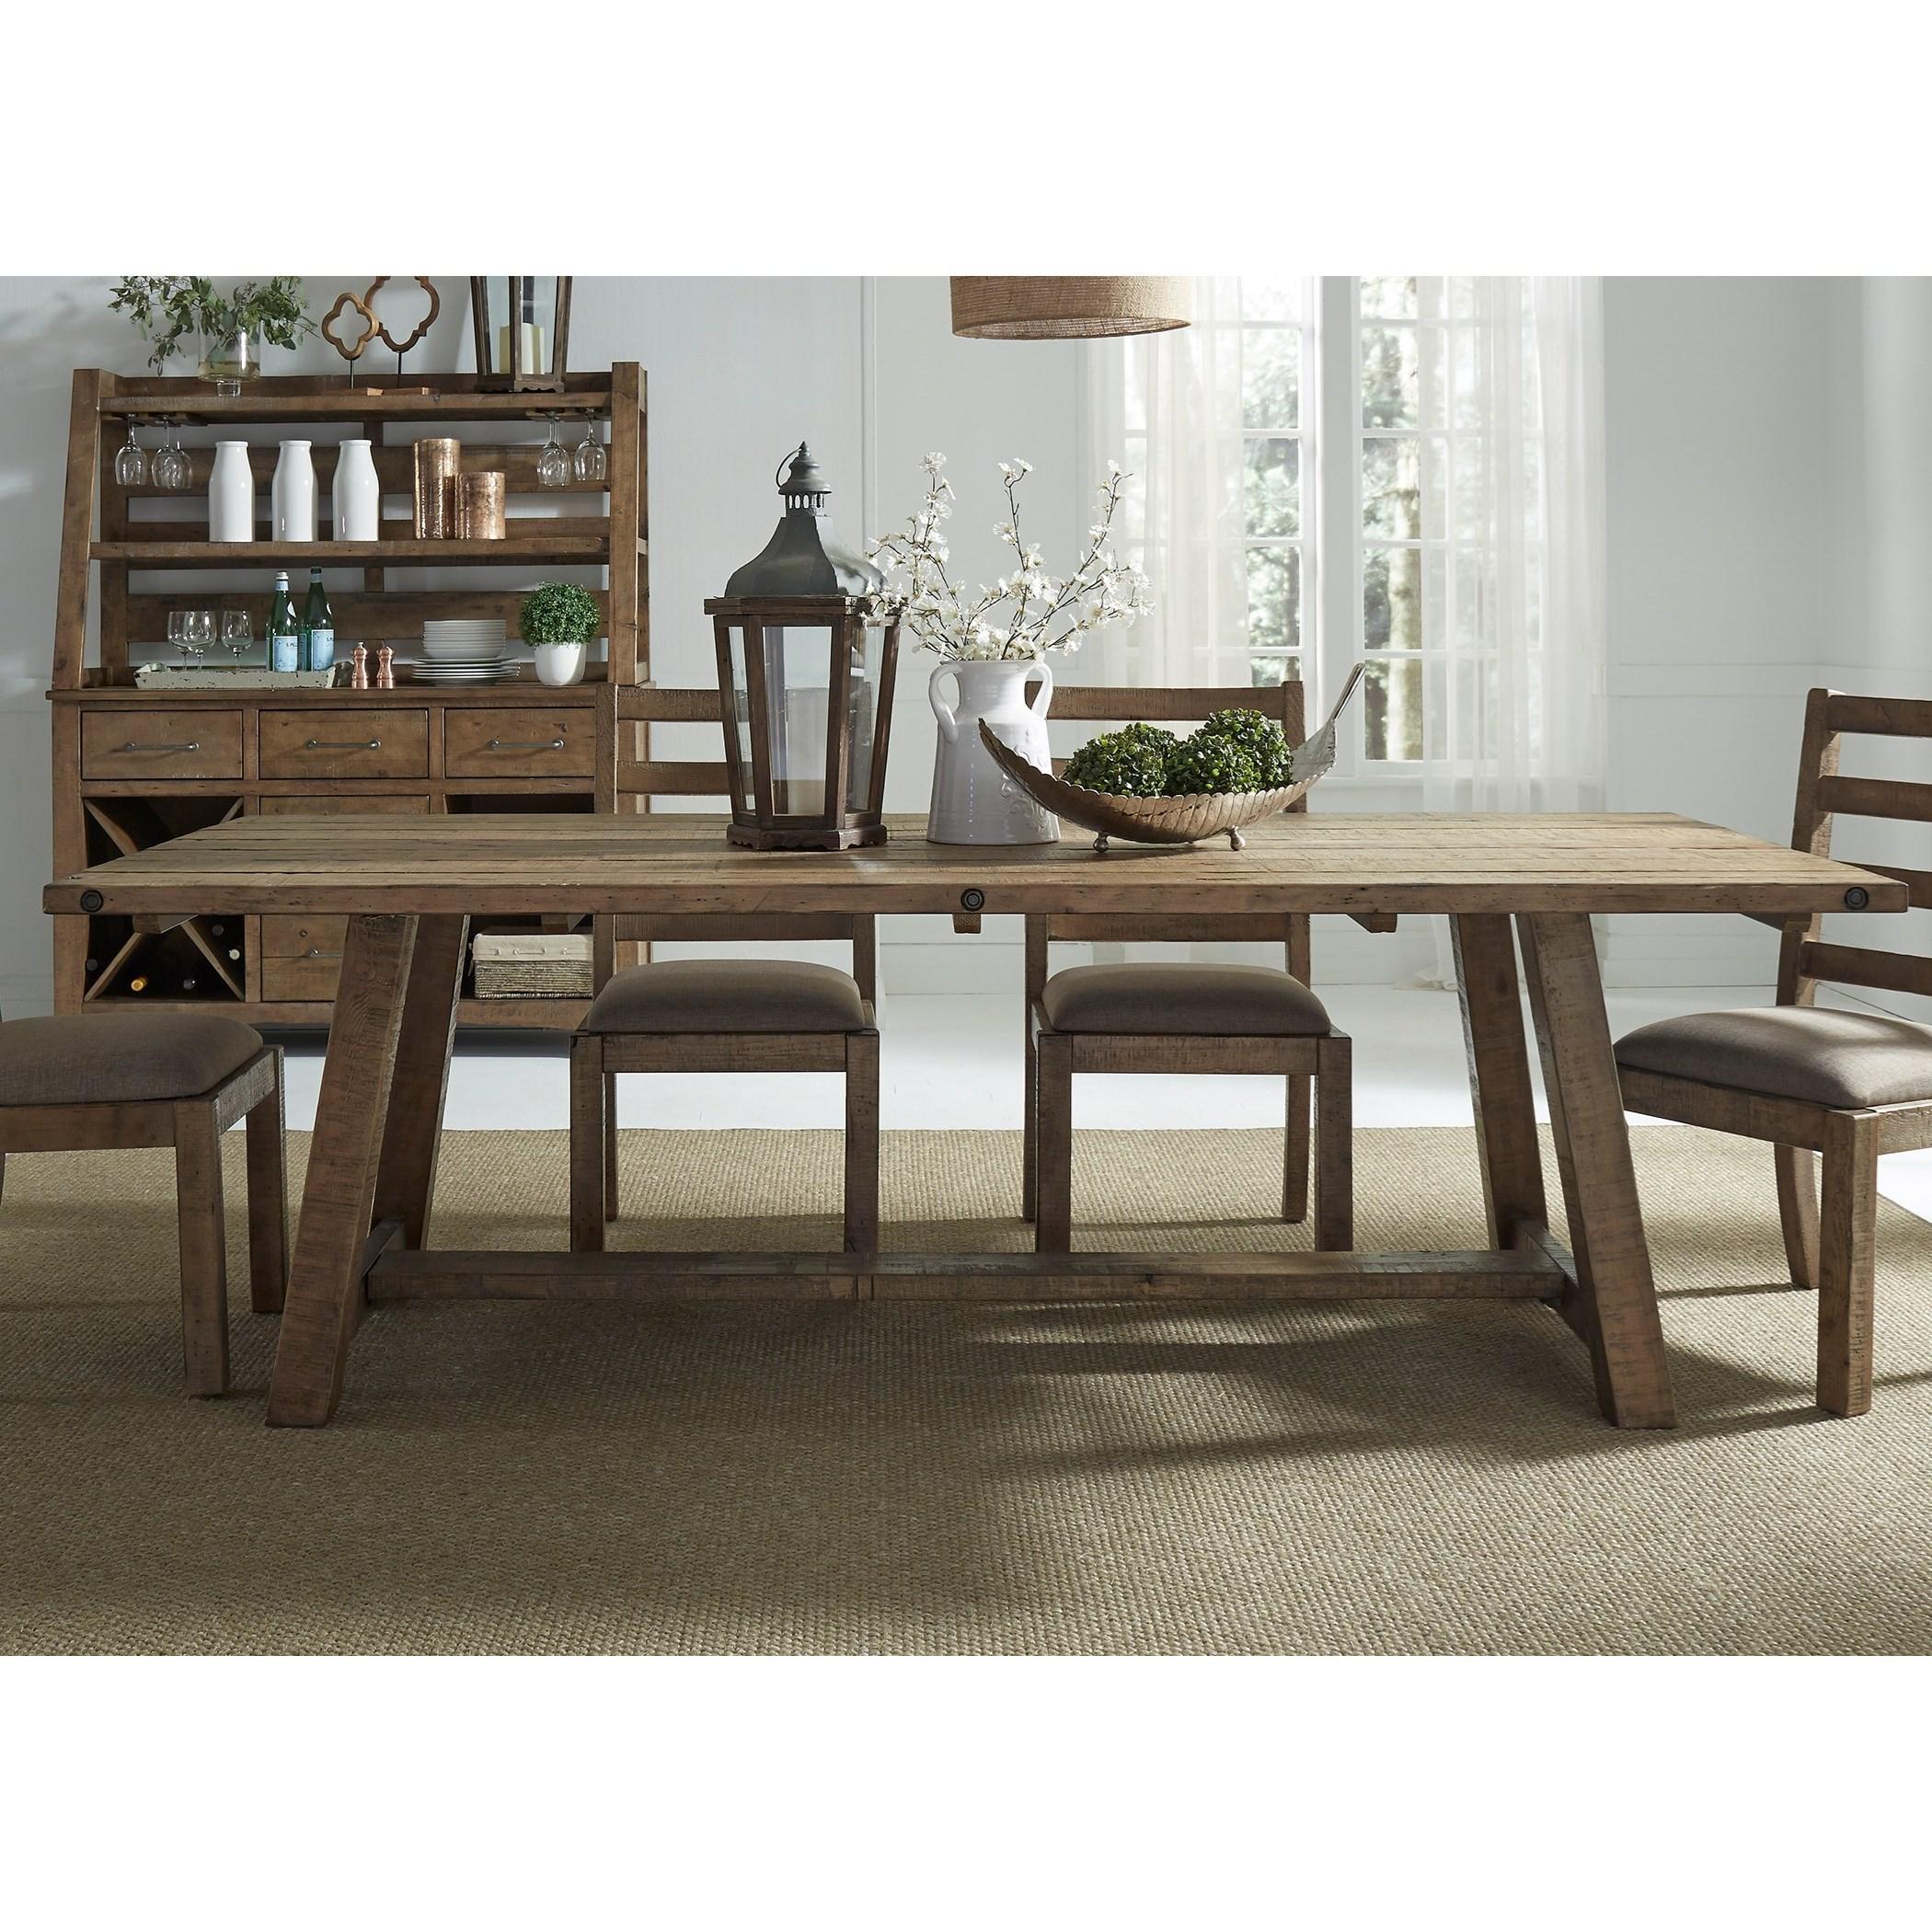 Vendor 5349 Prescott Valley Dining Trestle Table - Item Number: 178-P4296+T4296